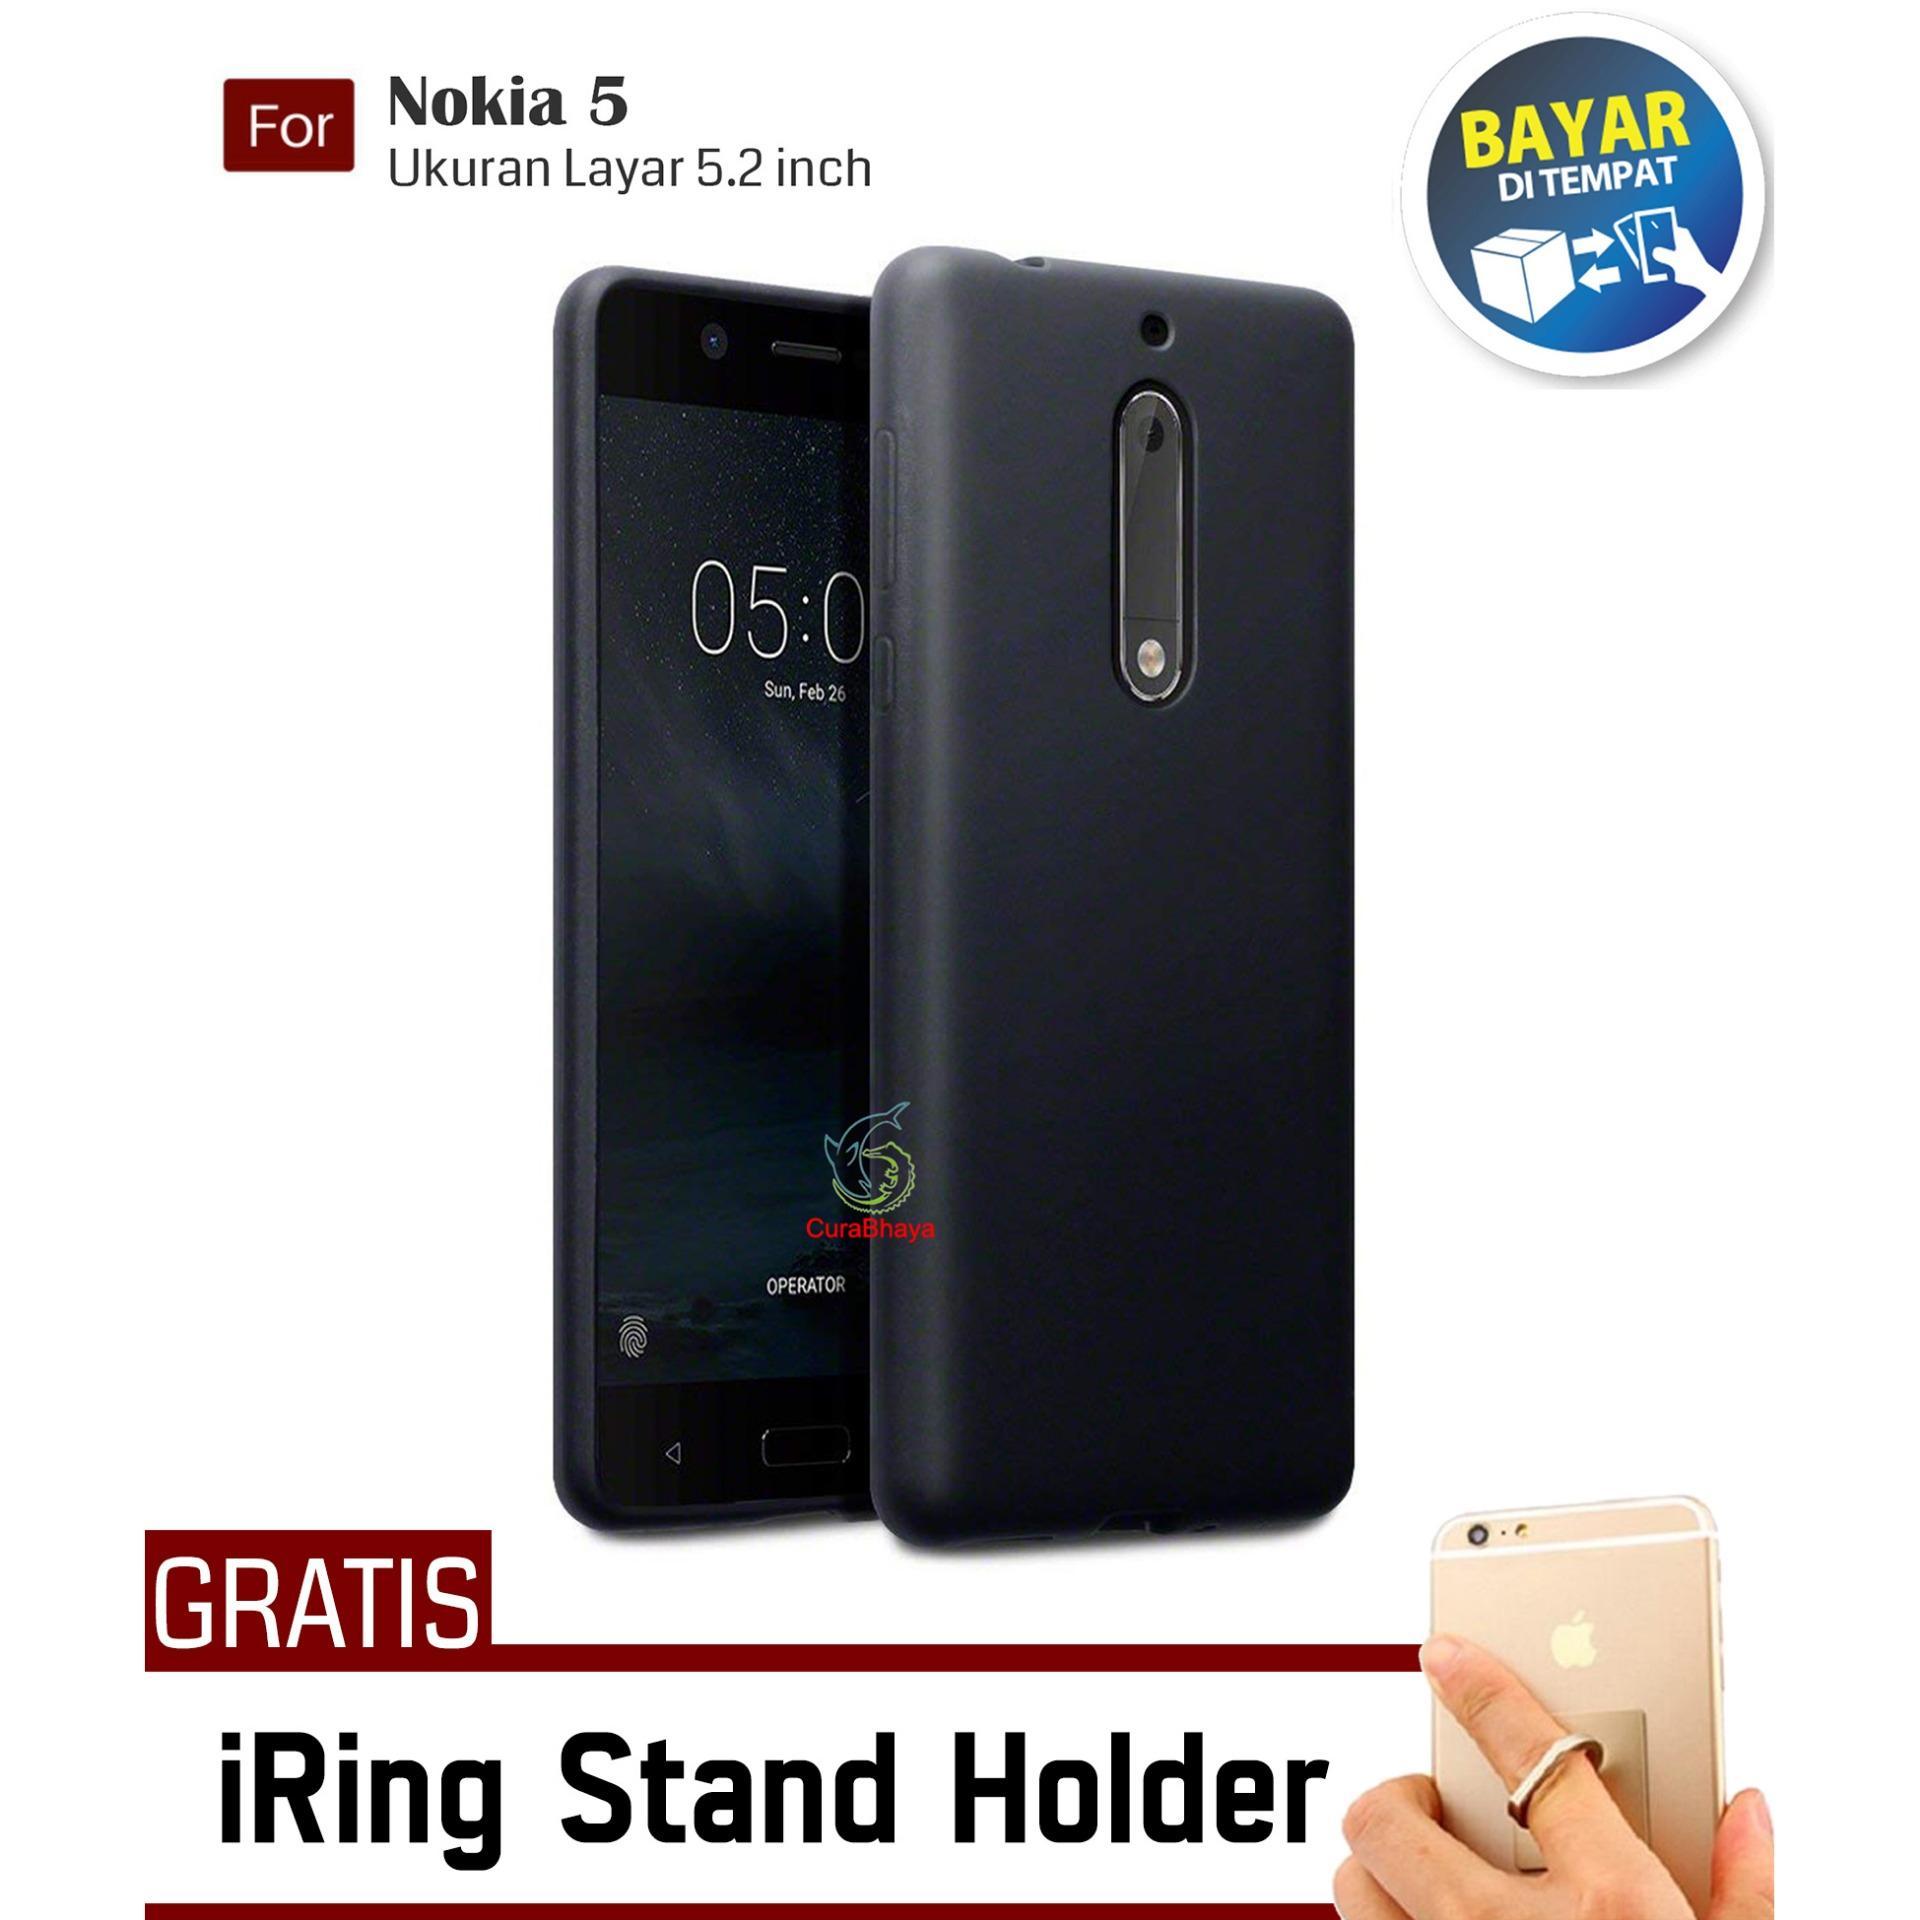 MidNight Nokia 5 | Slim Case Black Matte Softcase Premium Baby Skin + Gratis Free iRing